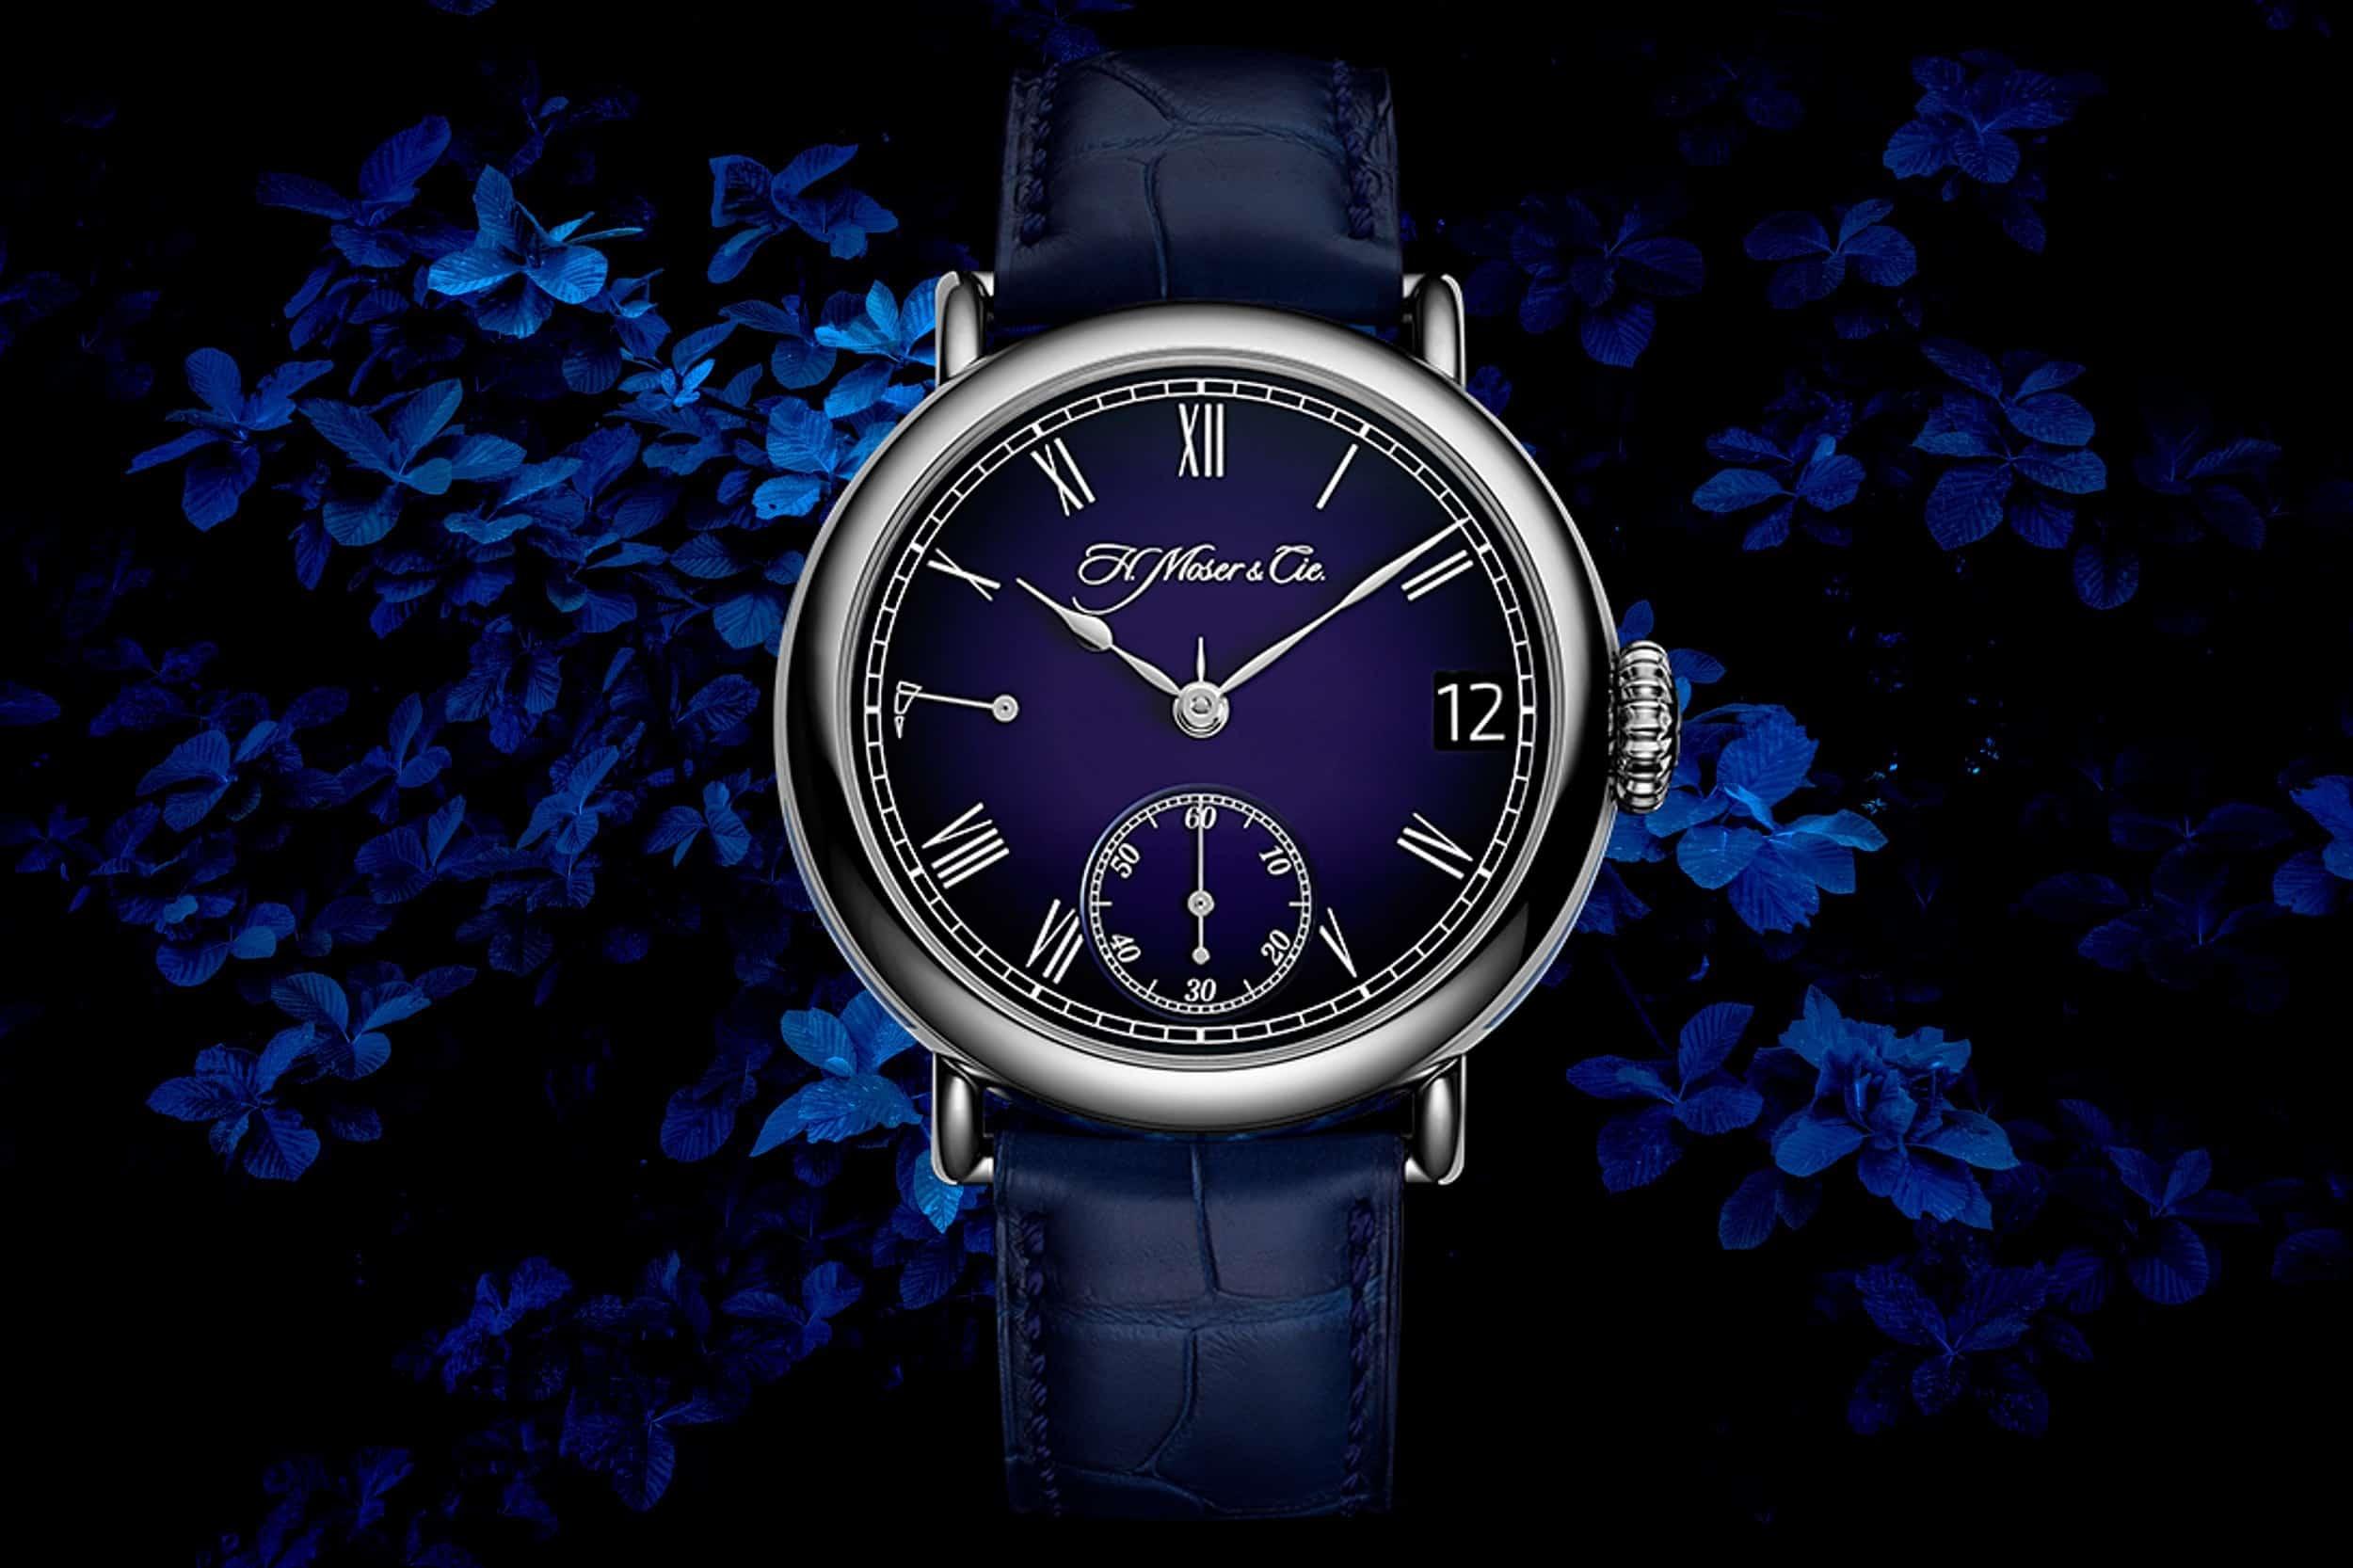 H Moser Heritage Perpetual Calendar Midnight Blue Enamel